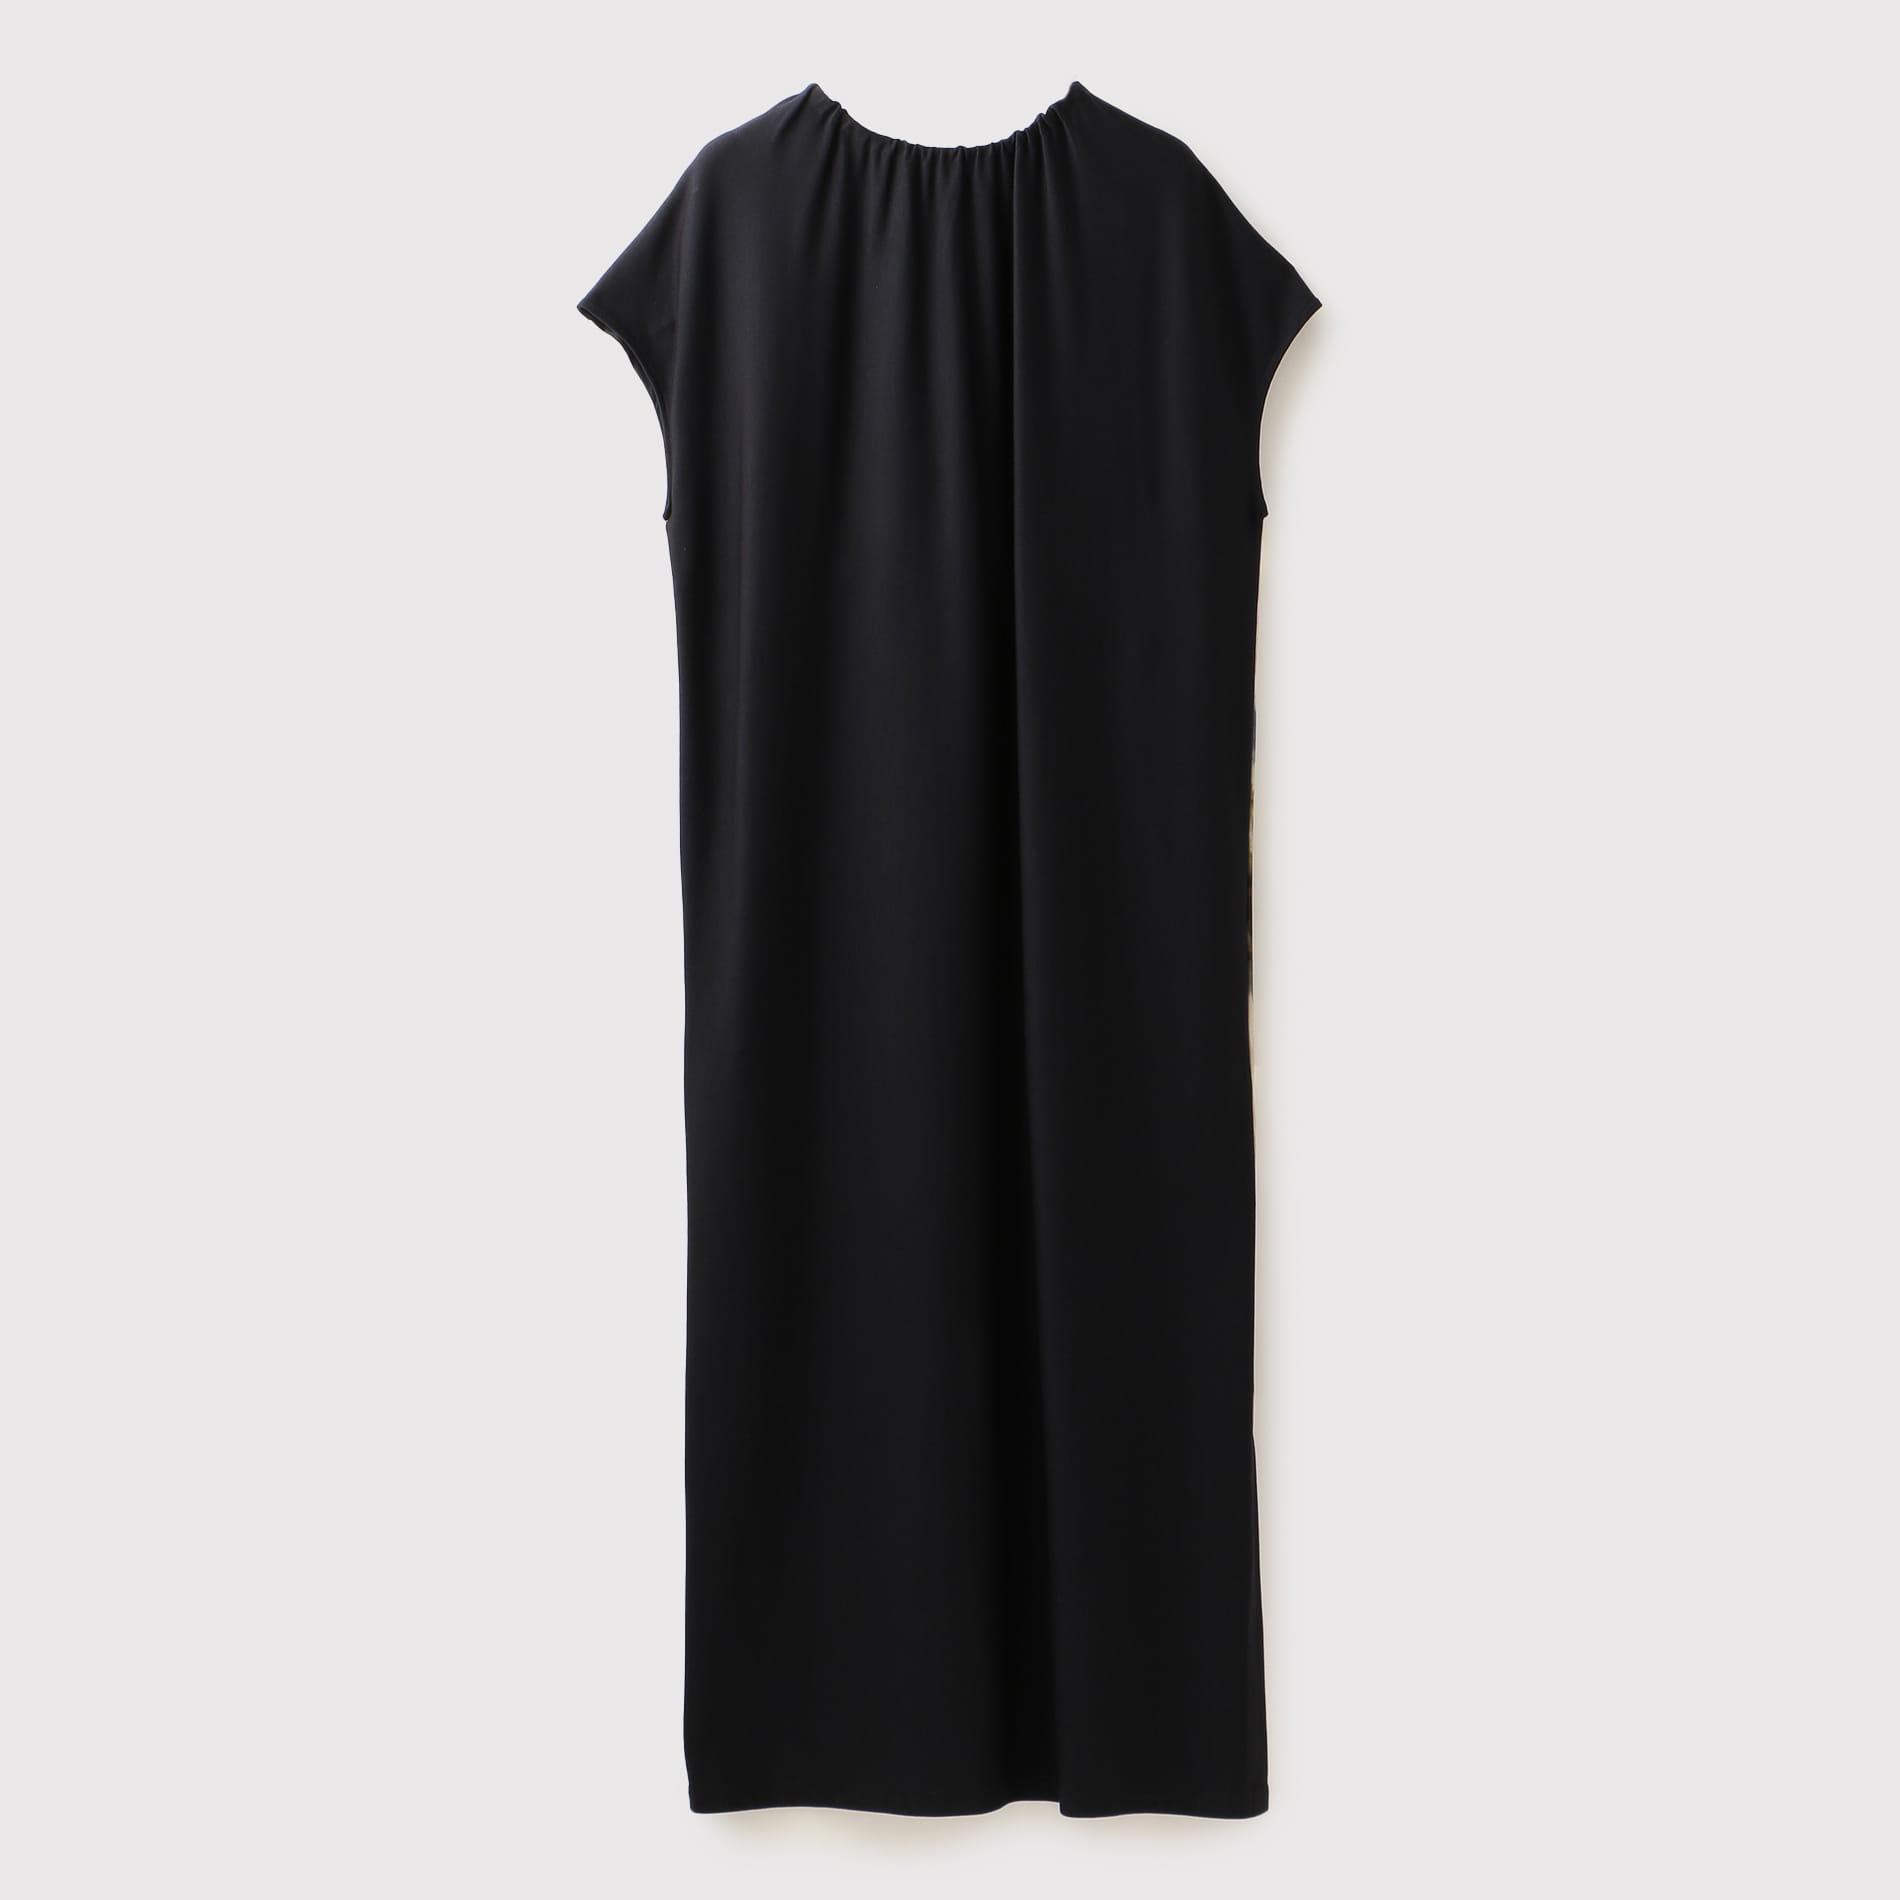 【muller of yoshiokubo】WOMEN フロントギャザードレス MLF19612-A